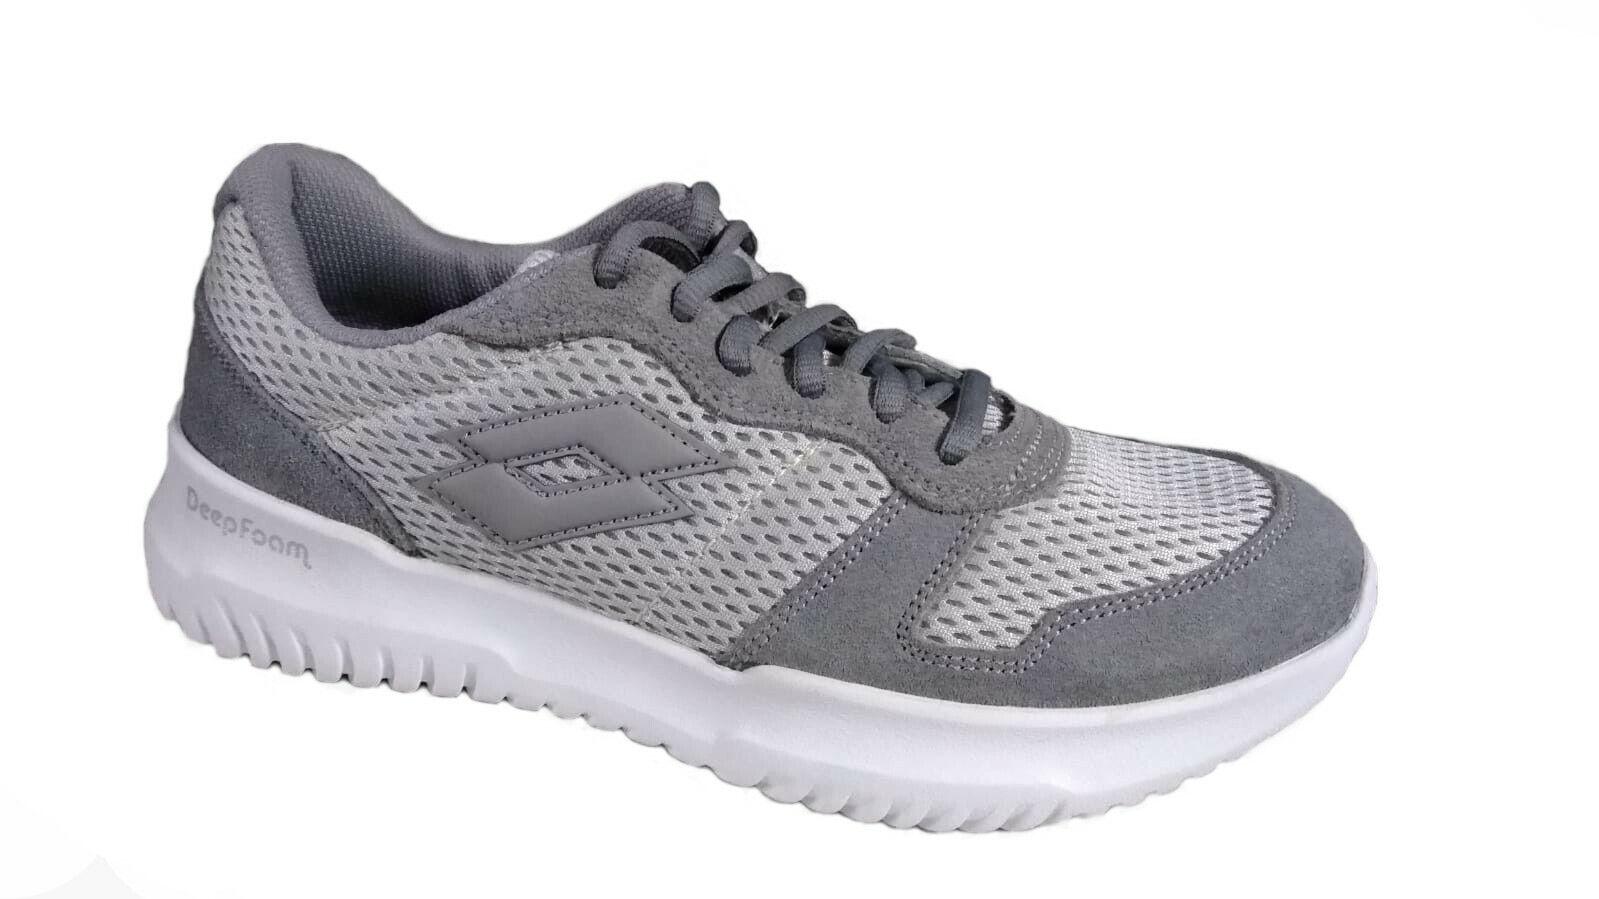 NEW Lot Shoes 210723 23p Grey Man Sneakers Fashion Low Memory Foam